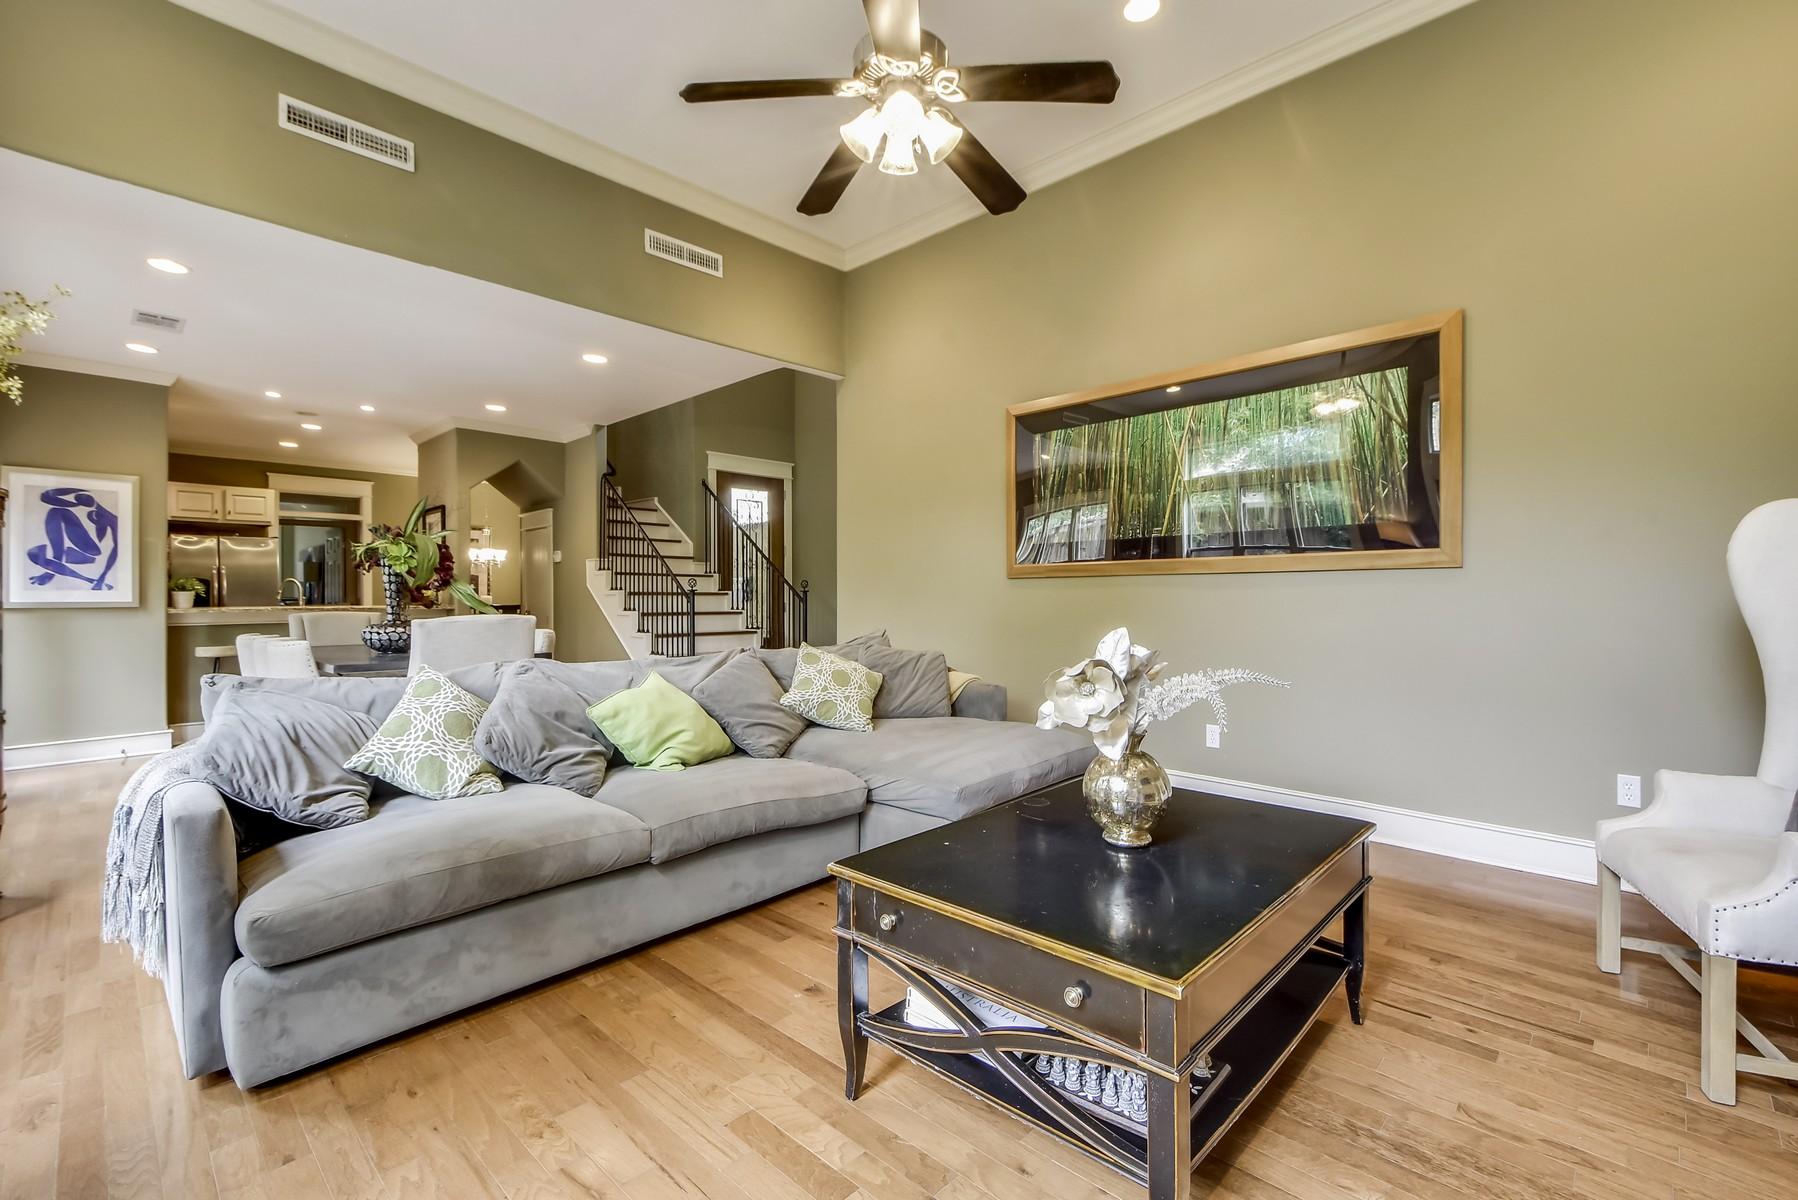 Additional photo for property listing at Fabulous Jim Hogg Condo 5600 Jim Hogg Ave B Austin, Texas 78756 United States